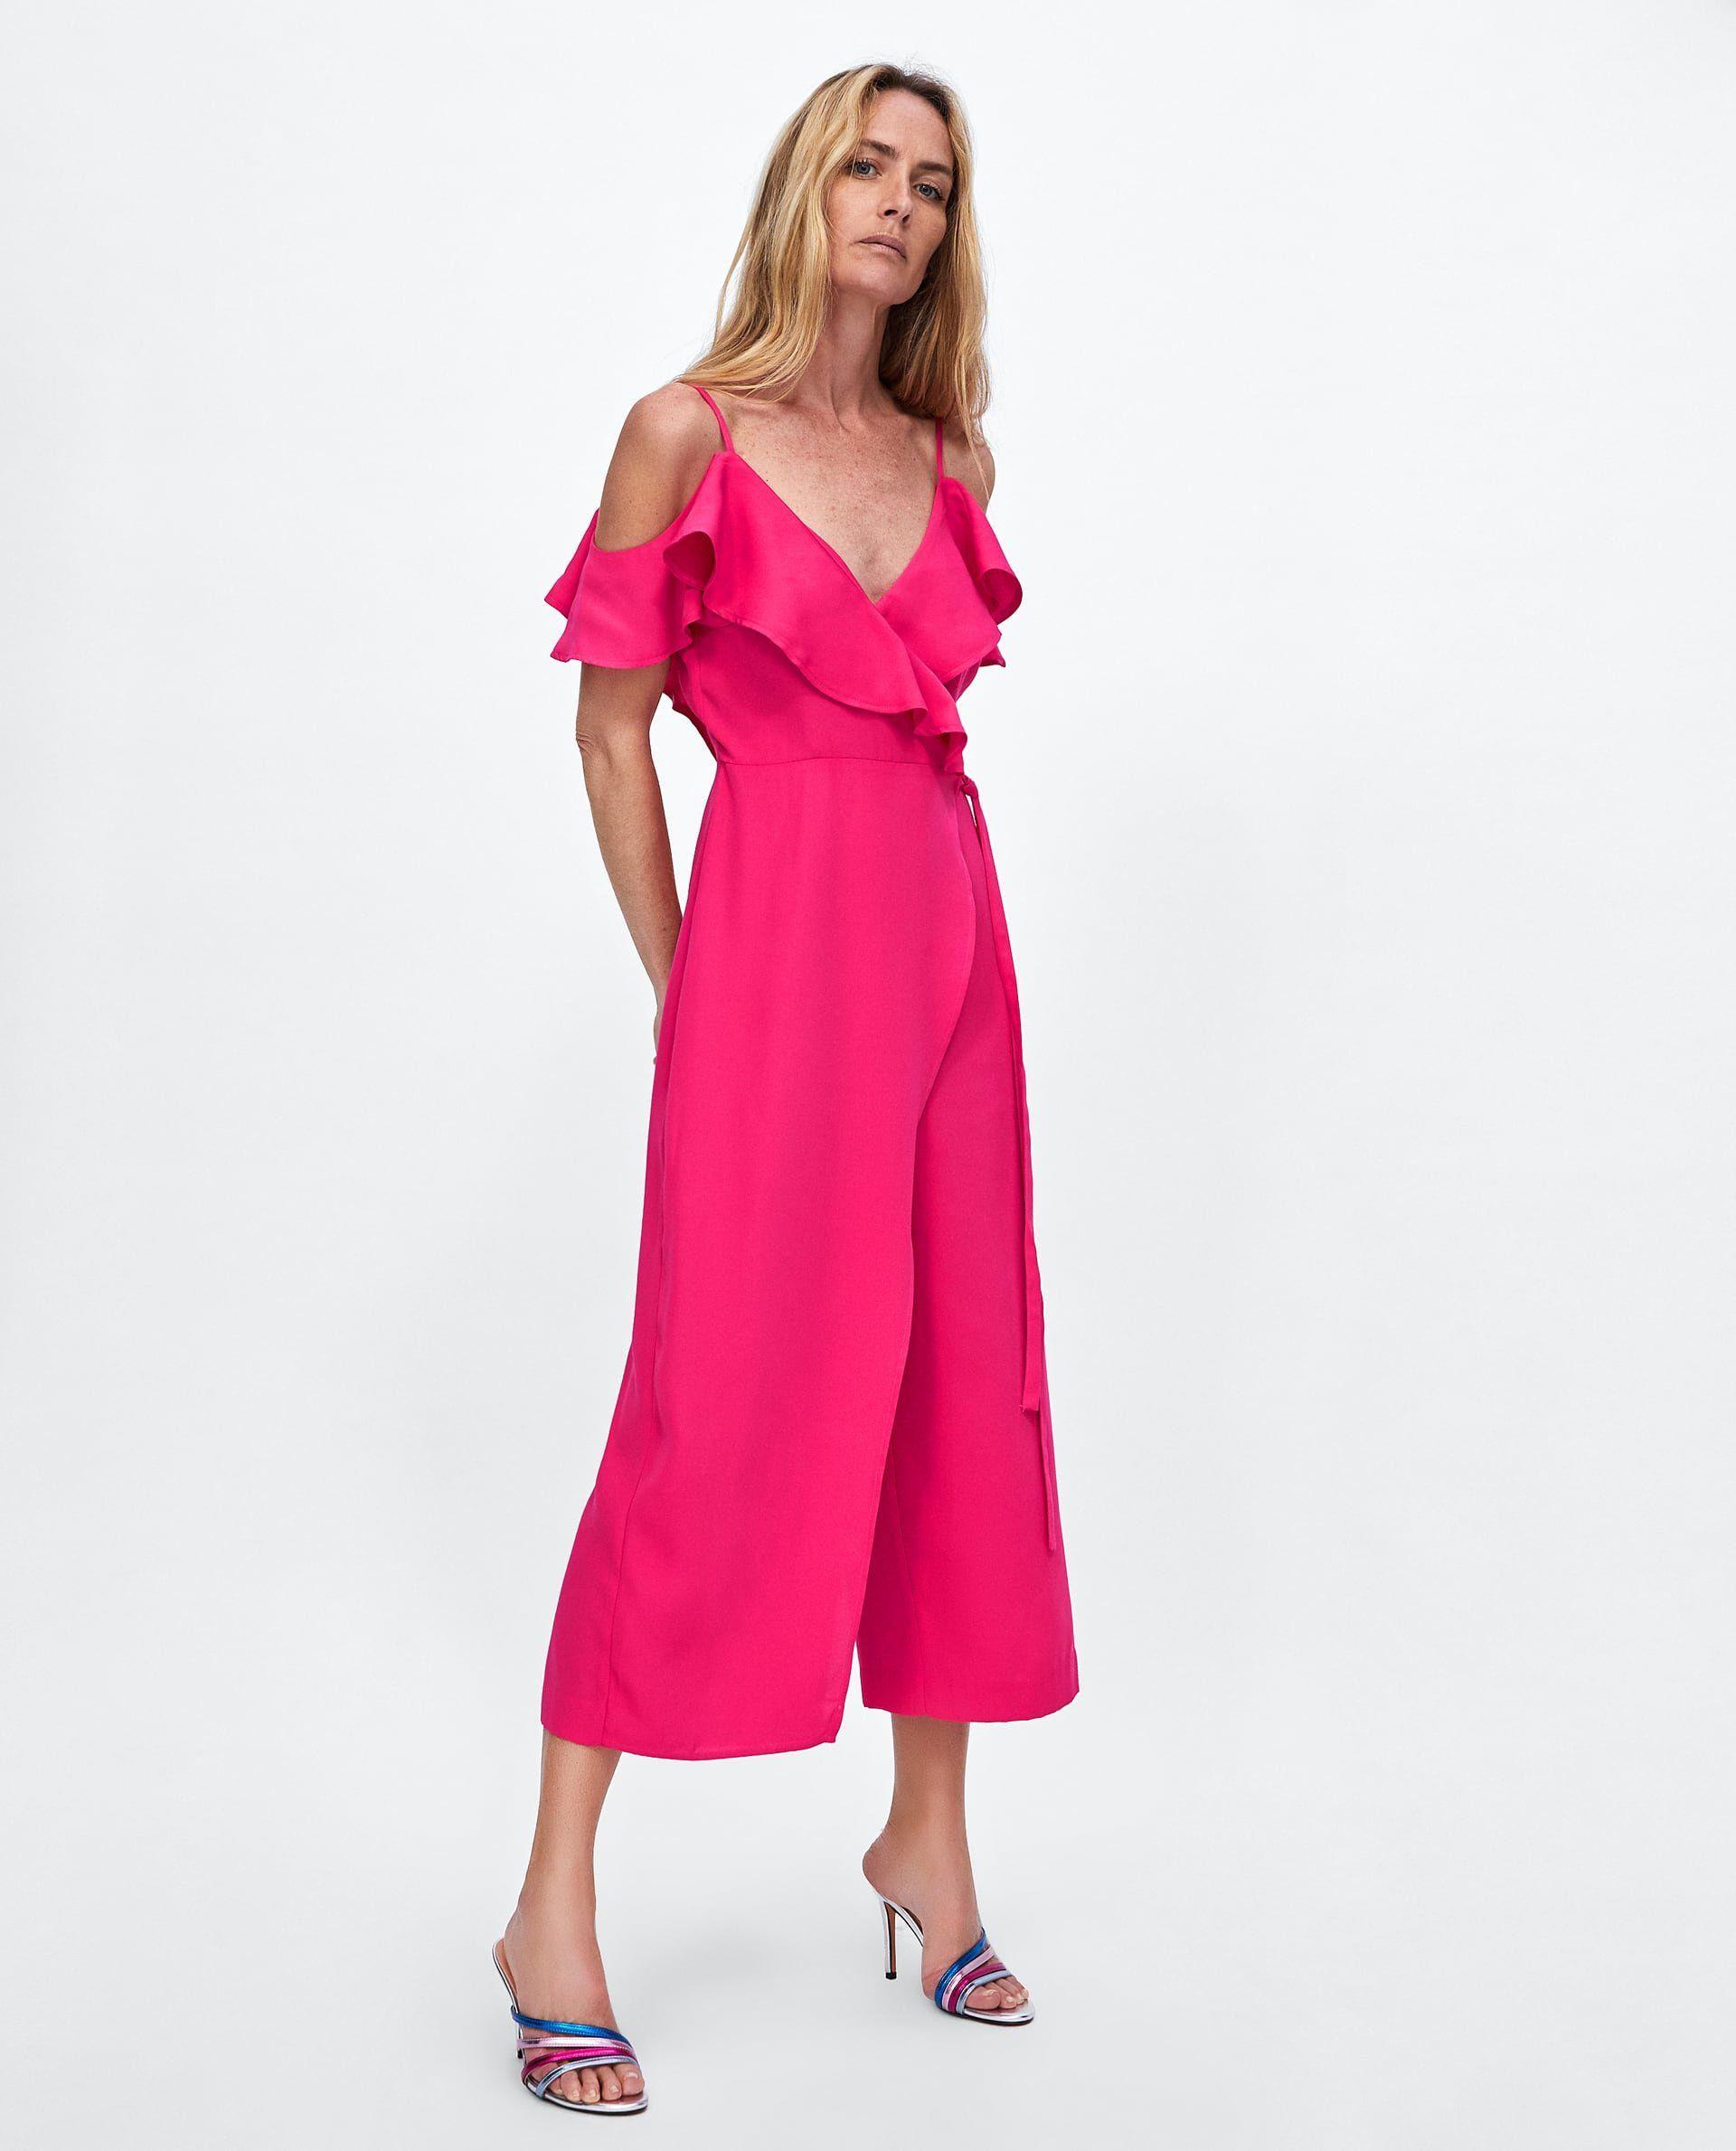 Zara Jumpsuit Zara Fashion Women Fashion Zara Jumpsuit [ jpg ]